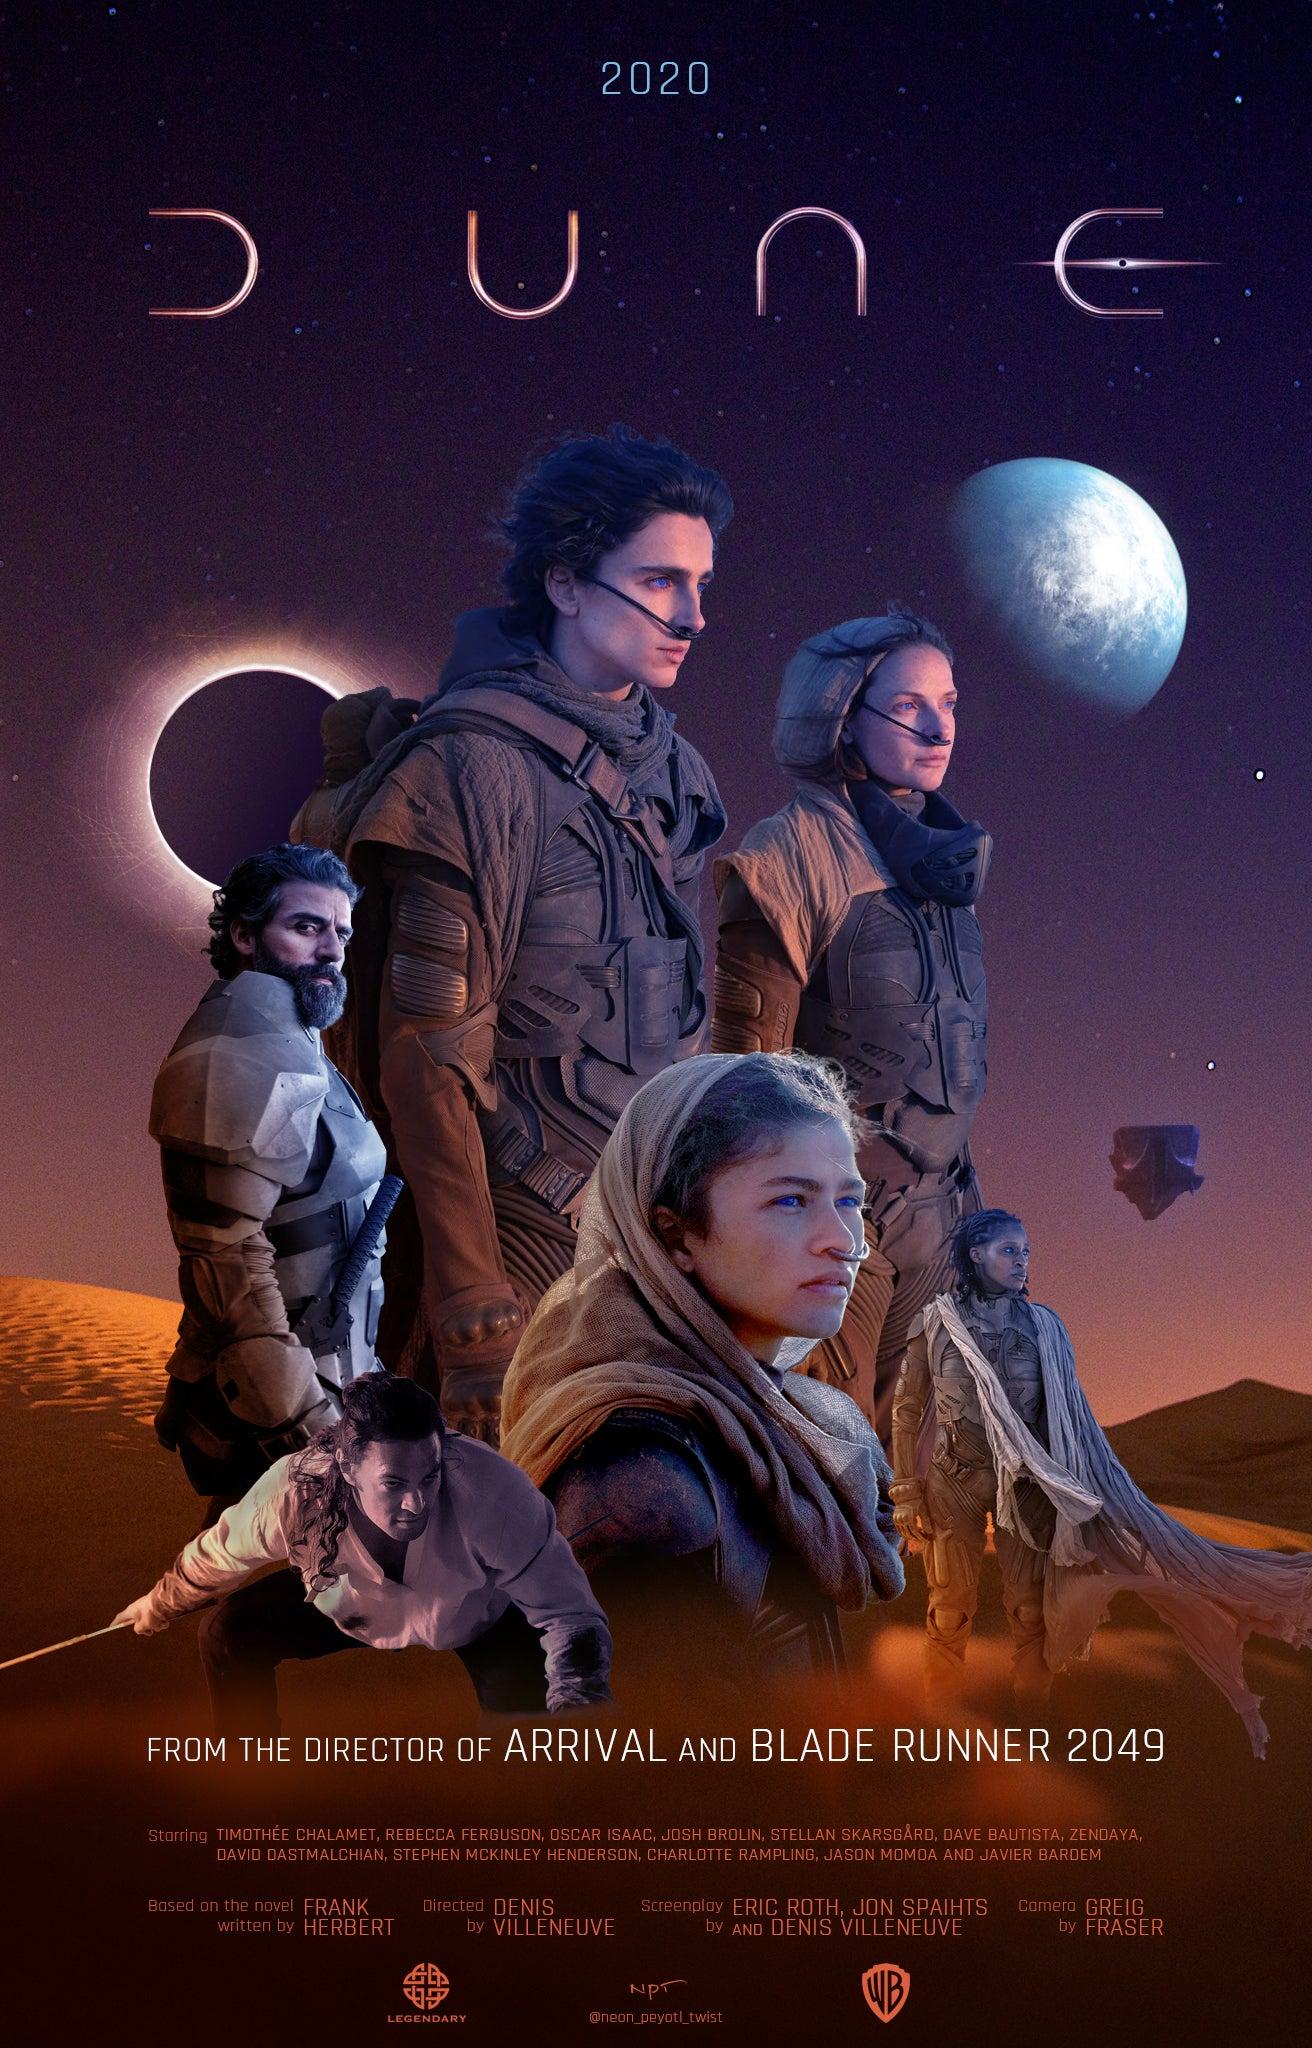 Dune (2021) movie poster